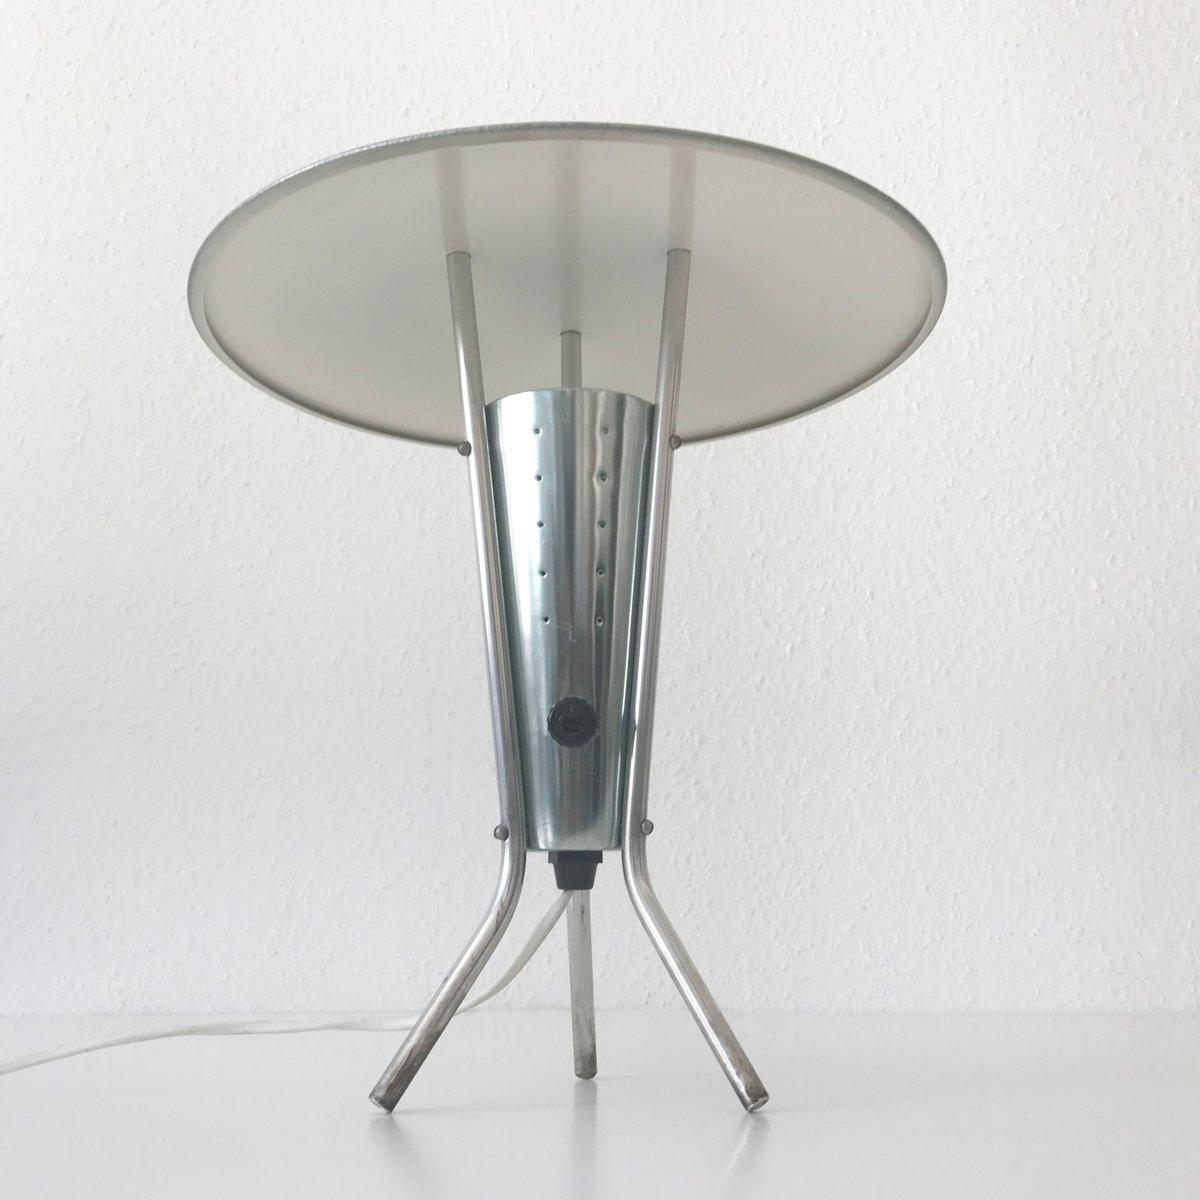 lampe de bureau sputnik mid century moderne 1950s en vente sur pamono. Black Bedroom Furniture Sets. Home Design Ideas